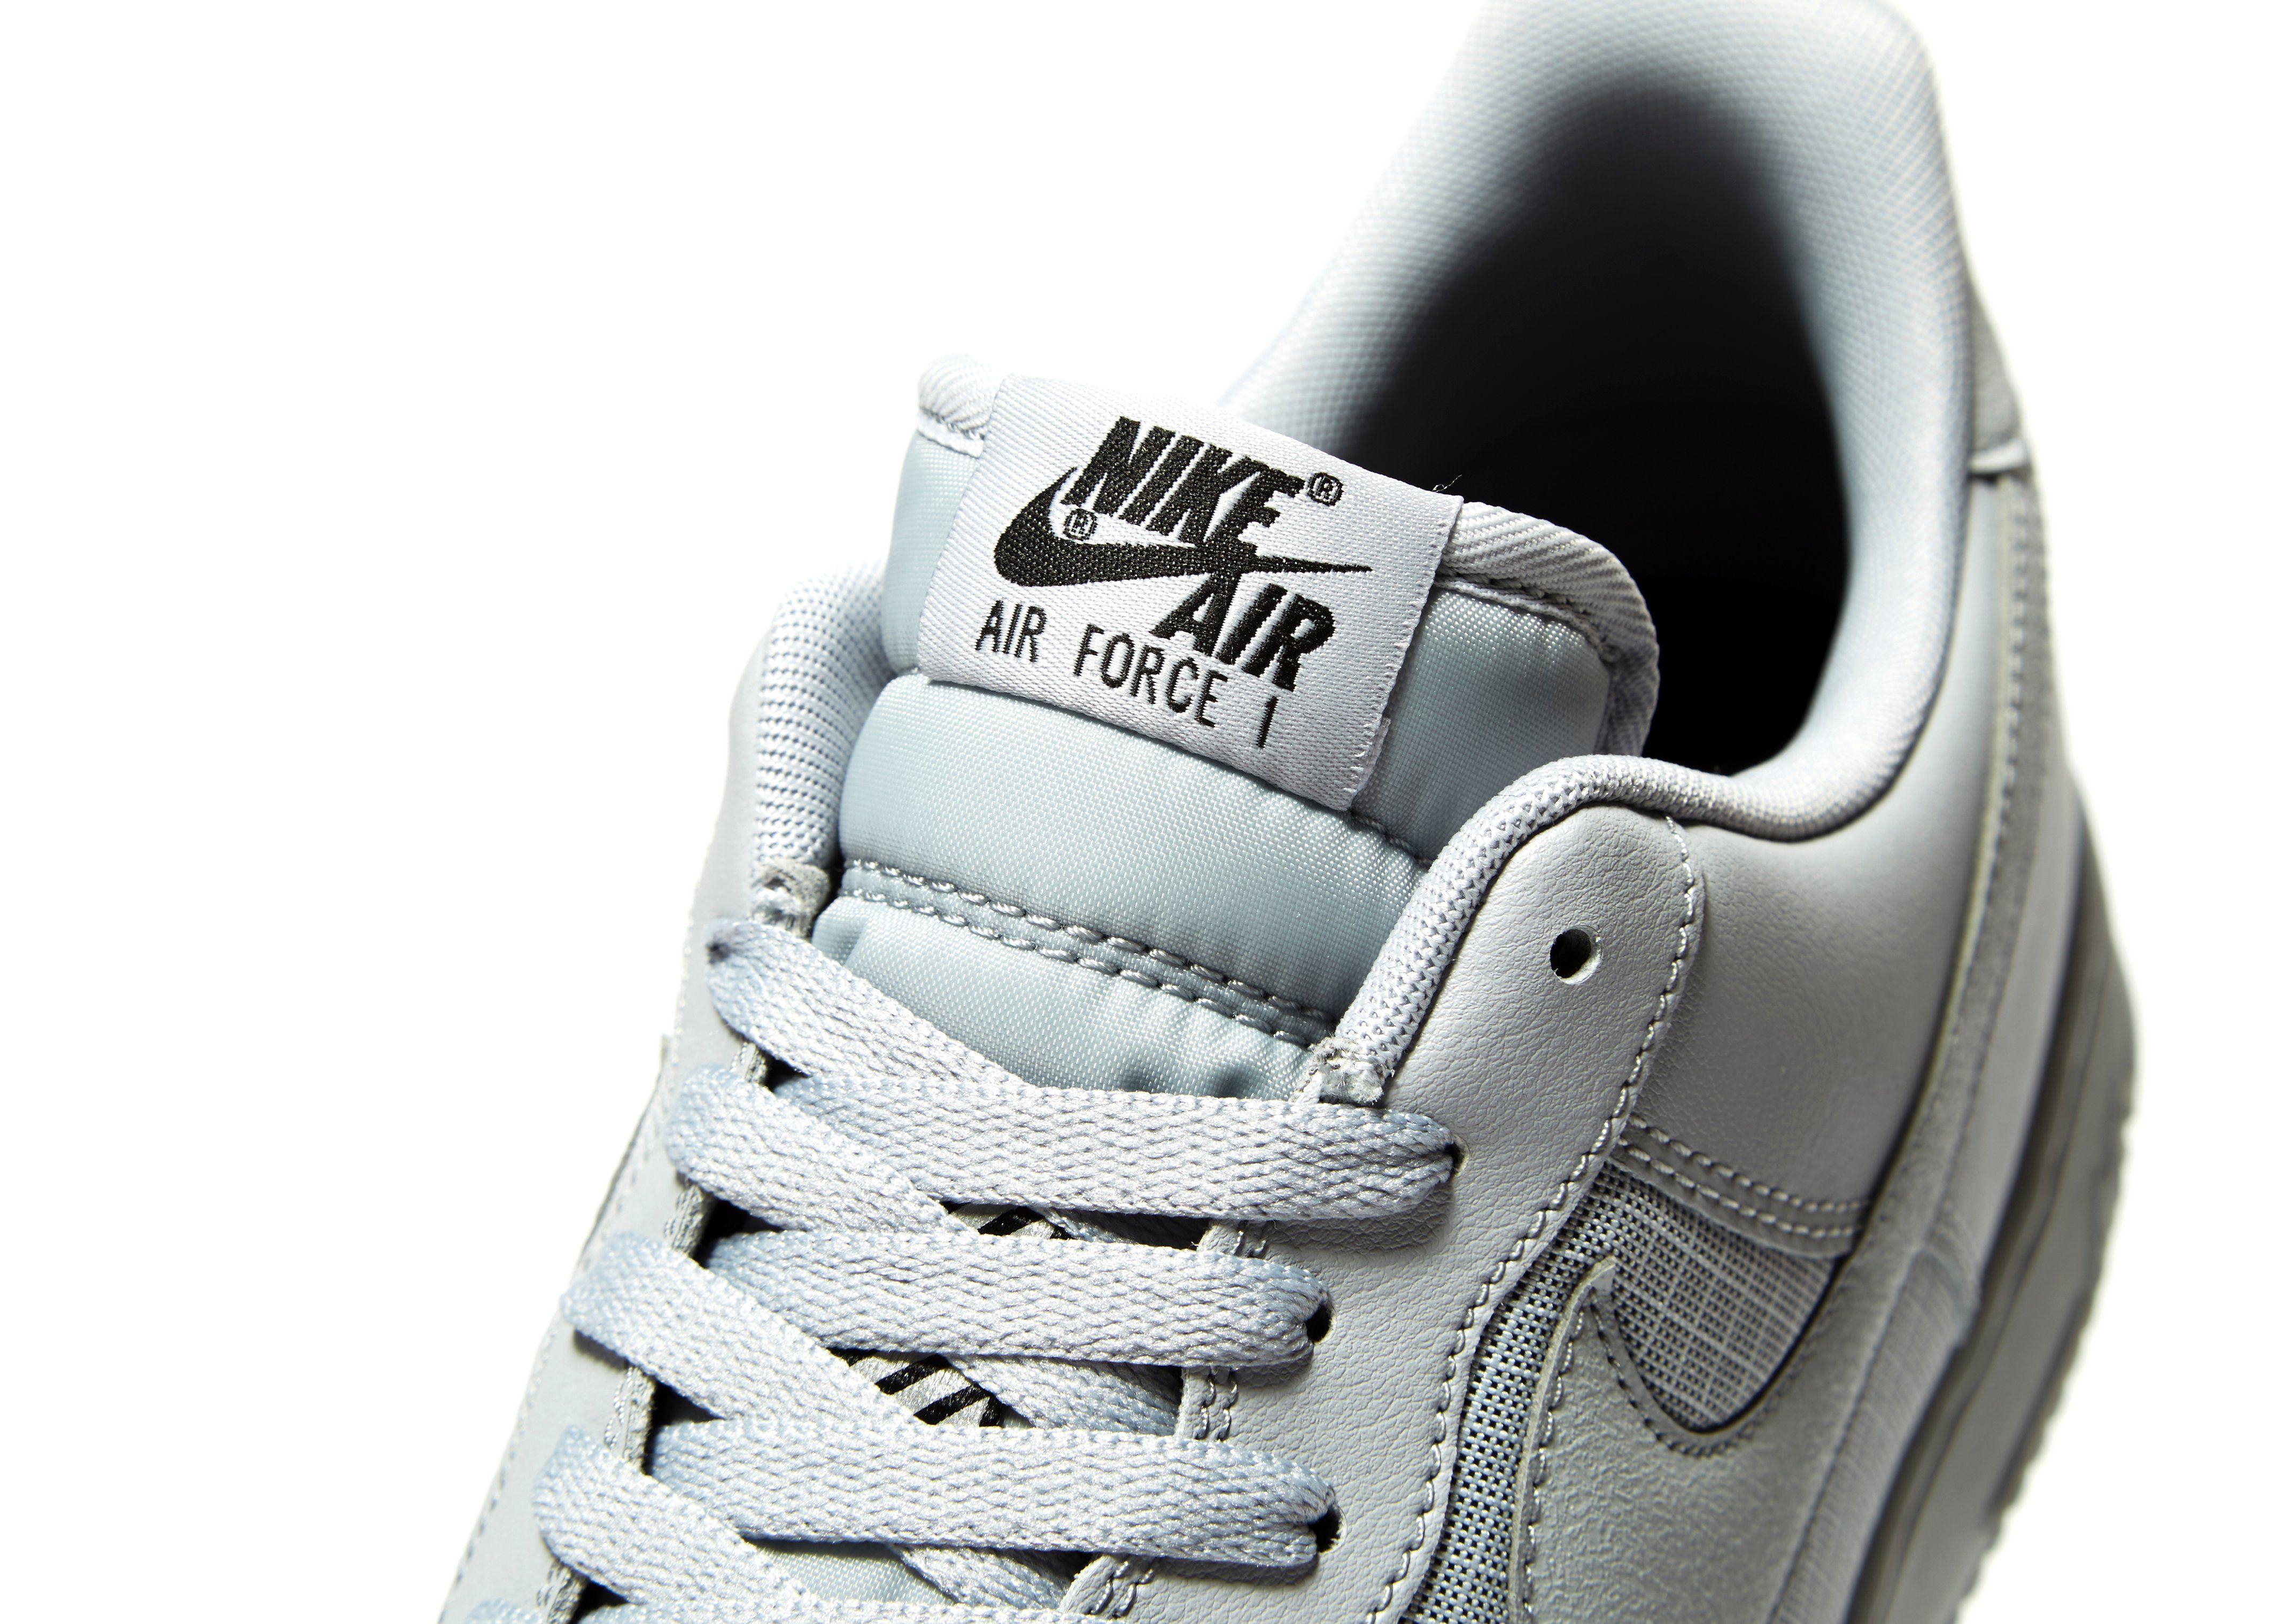 Nike Air Force 1 WP Grau-Weiß Grau Klassisch Billig Großer Verkauf Neue Große Überraschung Günstig Online 5HbruLU